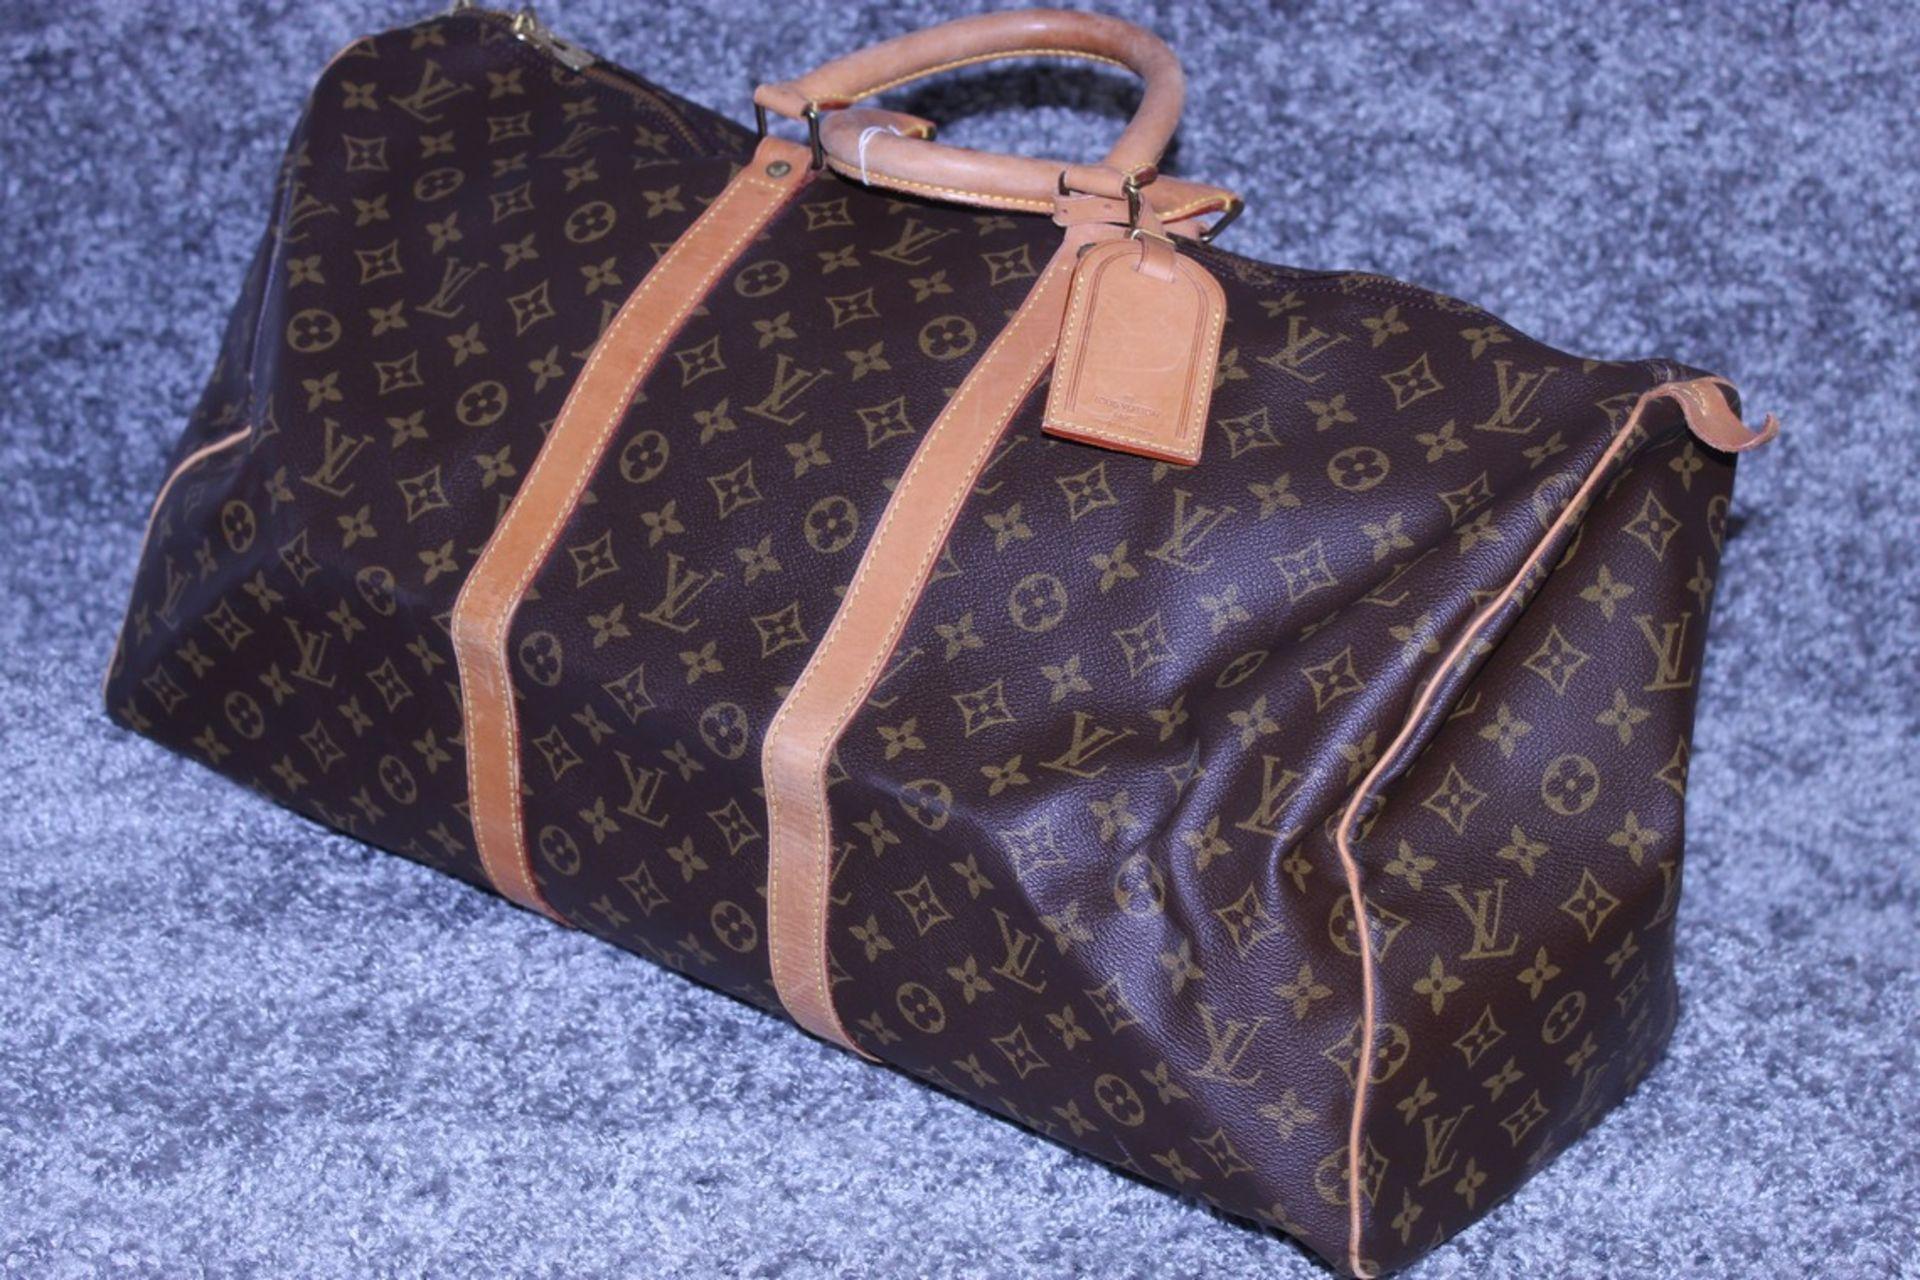 RRP £1,780 Louis Vuitton Keepall 55 Travel Bag, Brown Monogram Canvas, Vachetta Handles, 55X28X25Cm, - Image 3 of 5